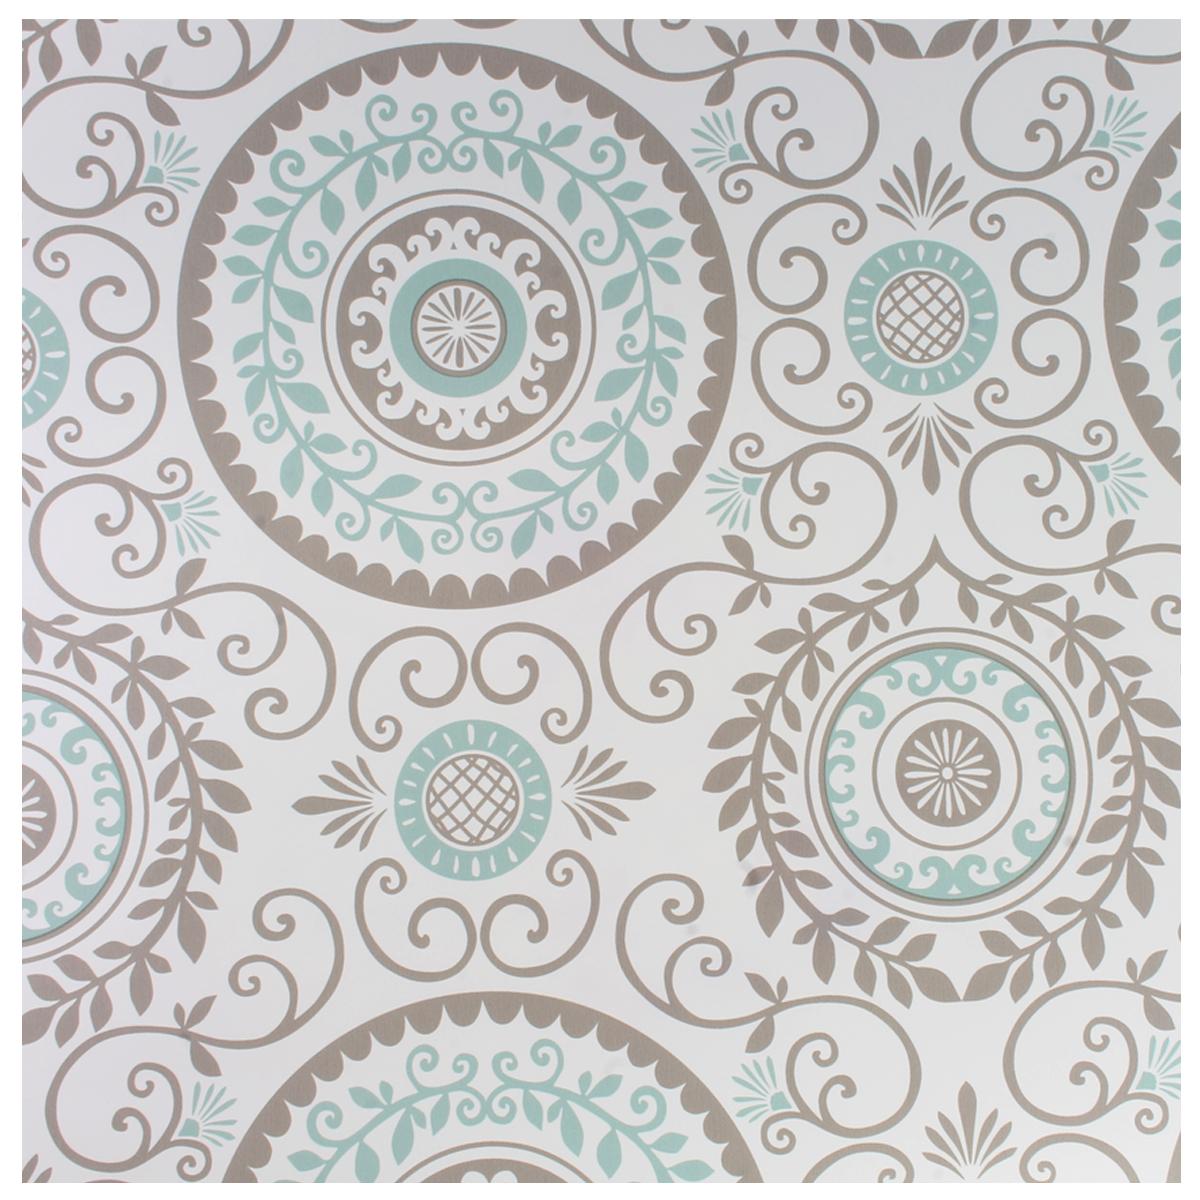 50 Artminds Peel And Stick Wallpaper On Wallpapersafari